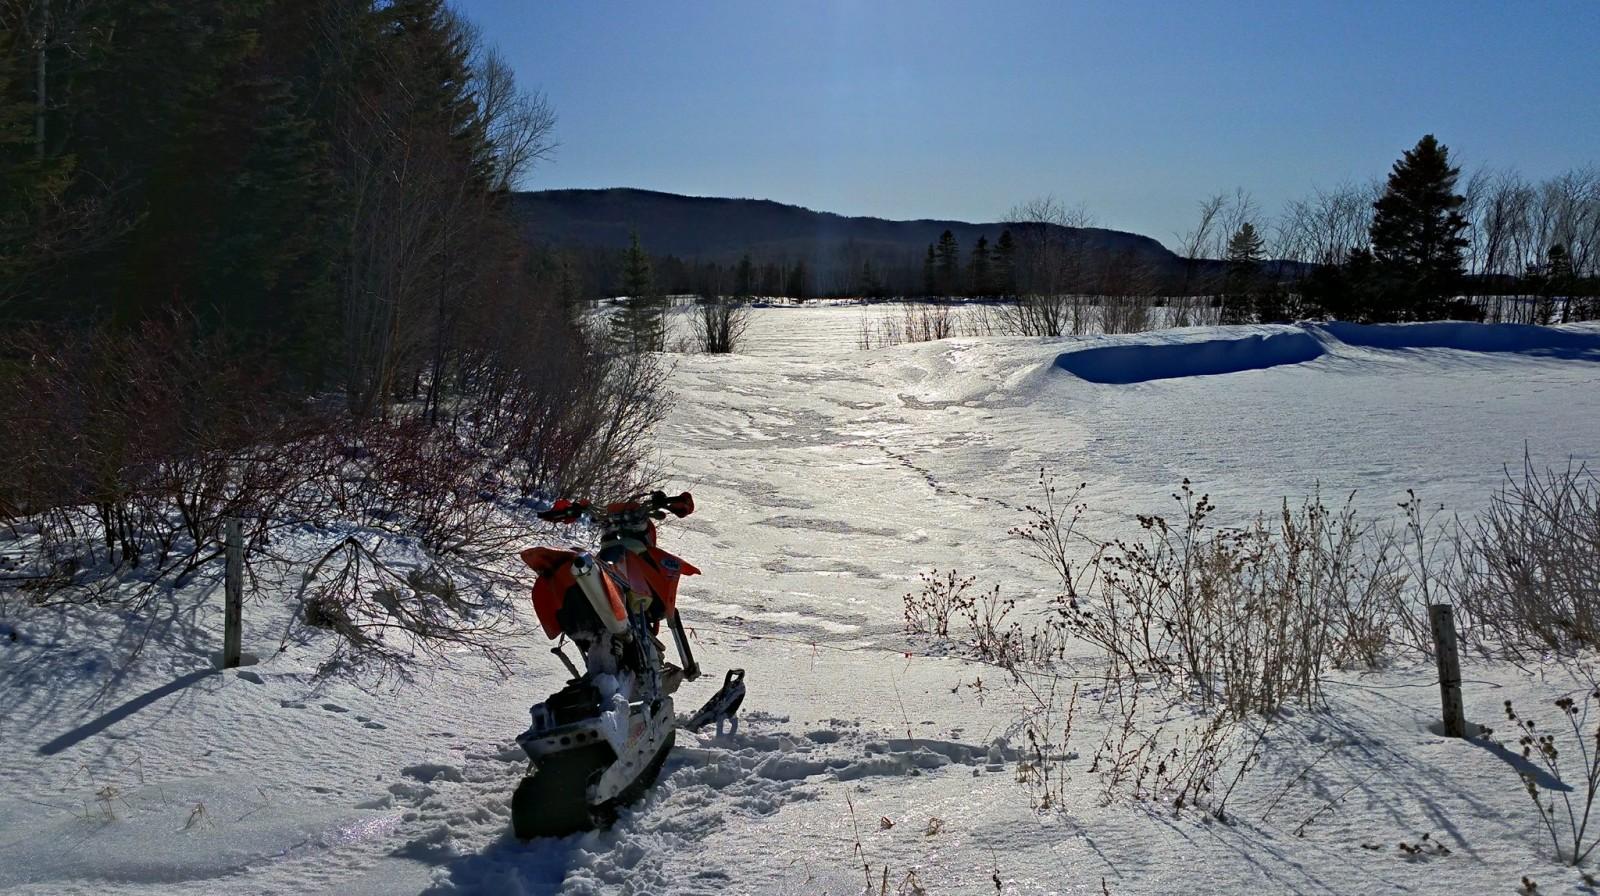 Explorer-snowbike-track-system-for-dirt-bike-supermoto-enduro-mx-AD-Boivin-66-1600x896